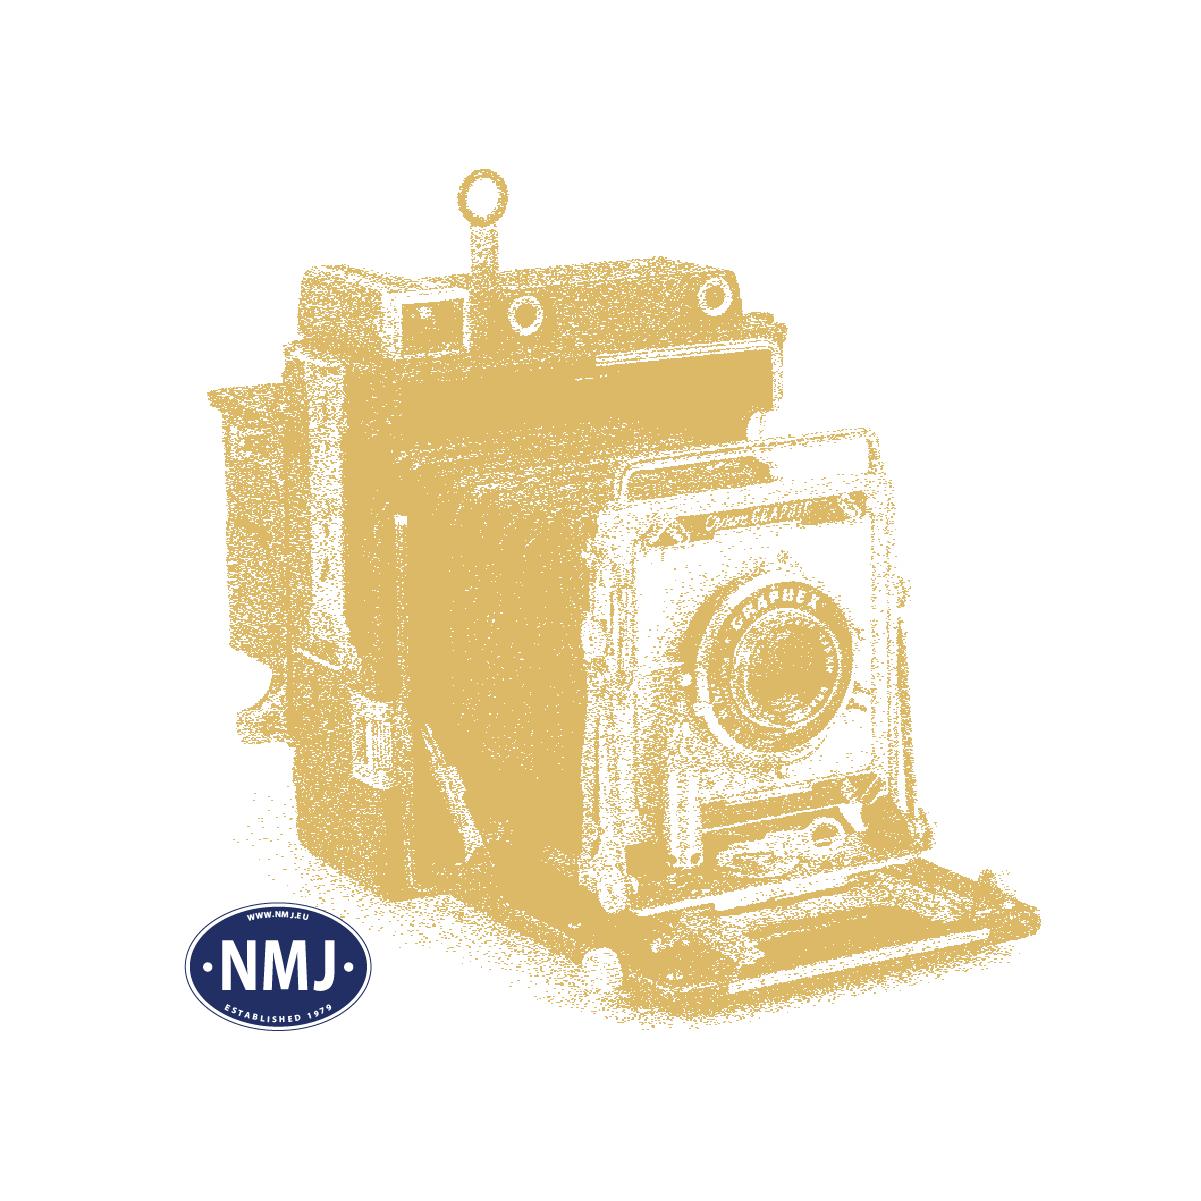 WODC1215 - Earth Color Kit, Maling